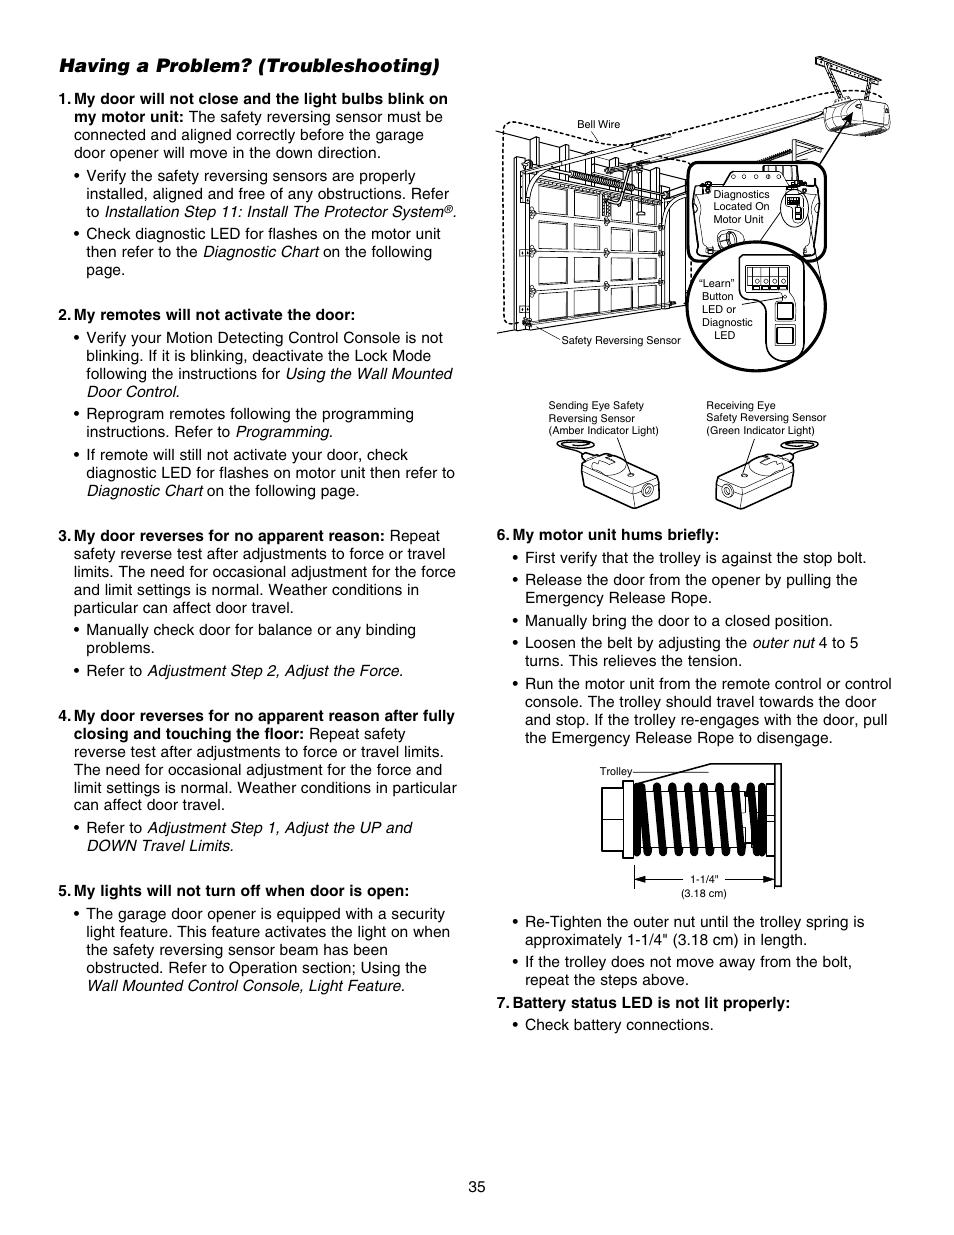 Having A Problem Troubleshooting Chamberlain 248754 User Manual Garage Door Opener Safety Reversing Sensor Wiring Diagram Page 35 44